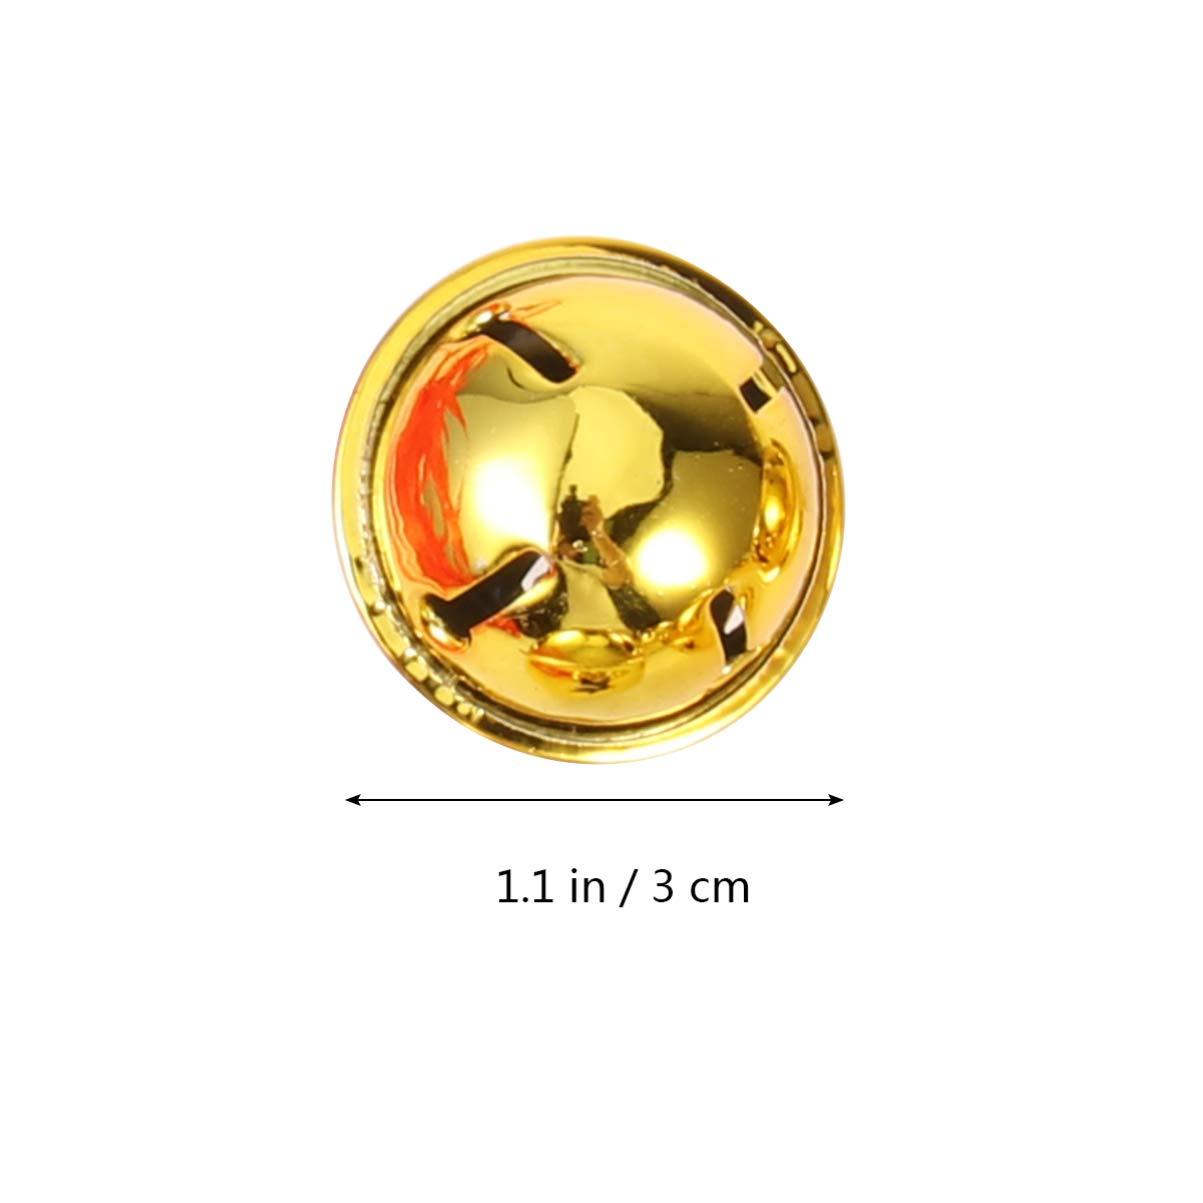 Amosfun Lot de 21 cloches d/écoratives de No/ël /à suspendre avec ruban 3 cm Fer dor/é 3 * 3CM